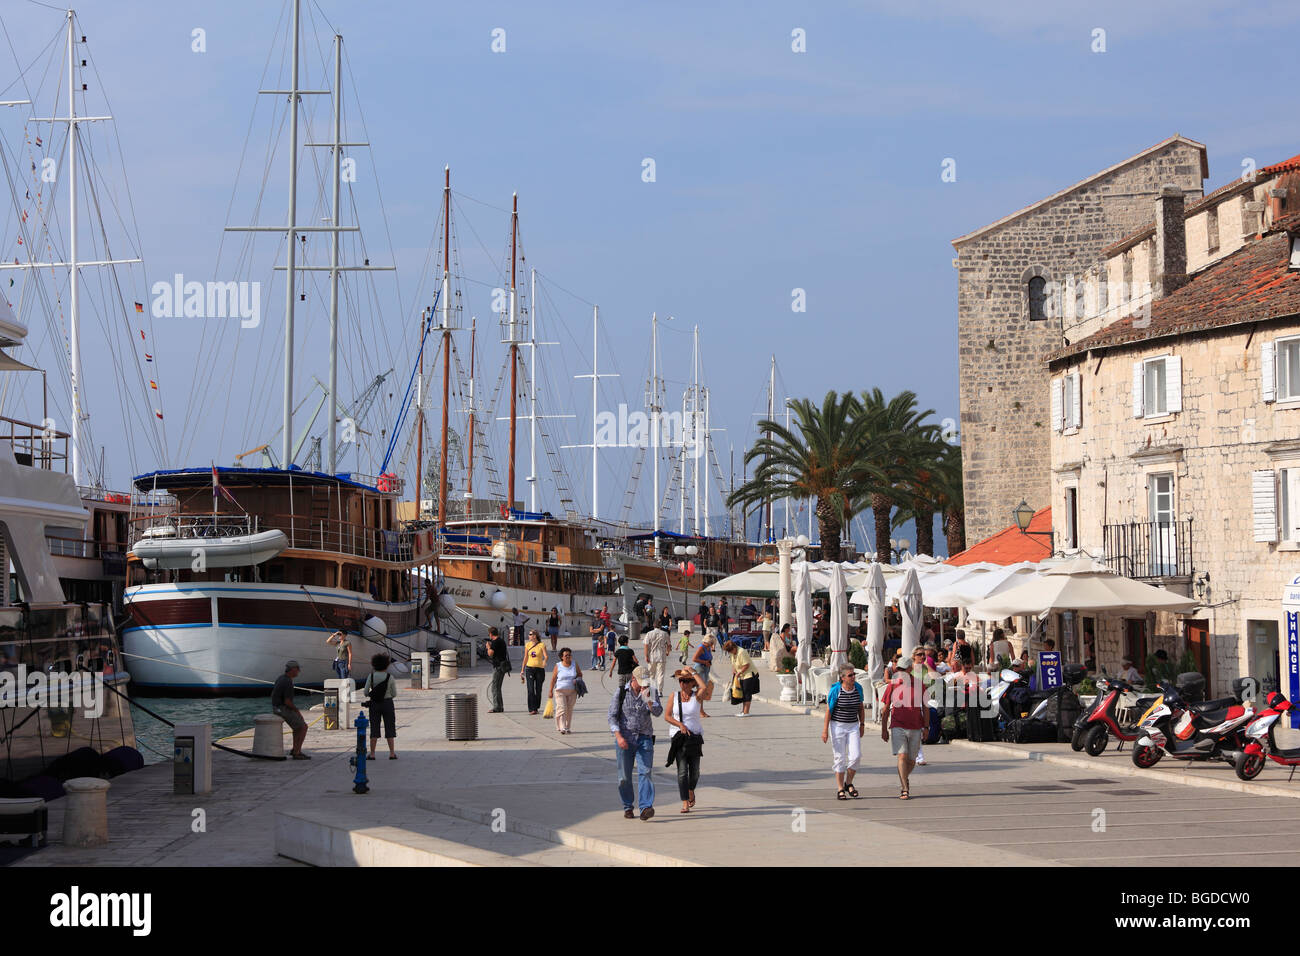 Promenade and sailing ships, Trogir, Adriatic Sea, Dalmatia, Croatia, Europe - Stock Image